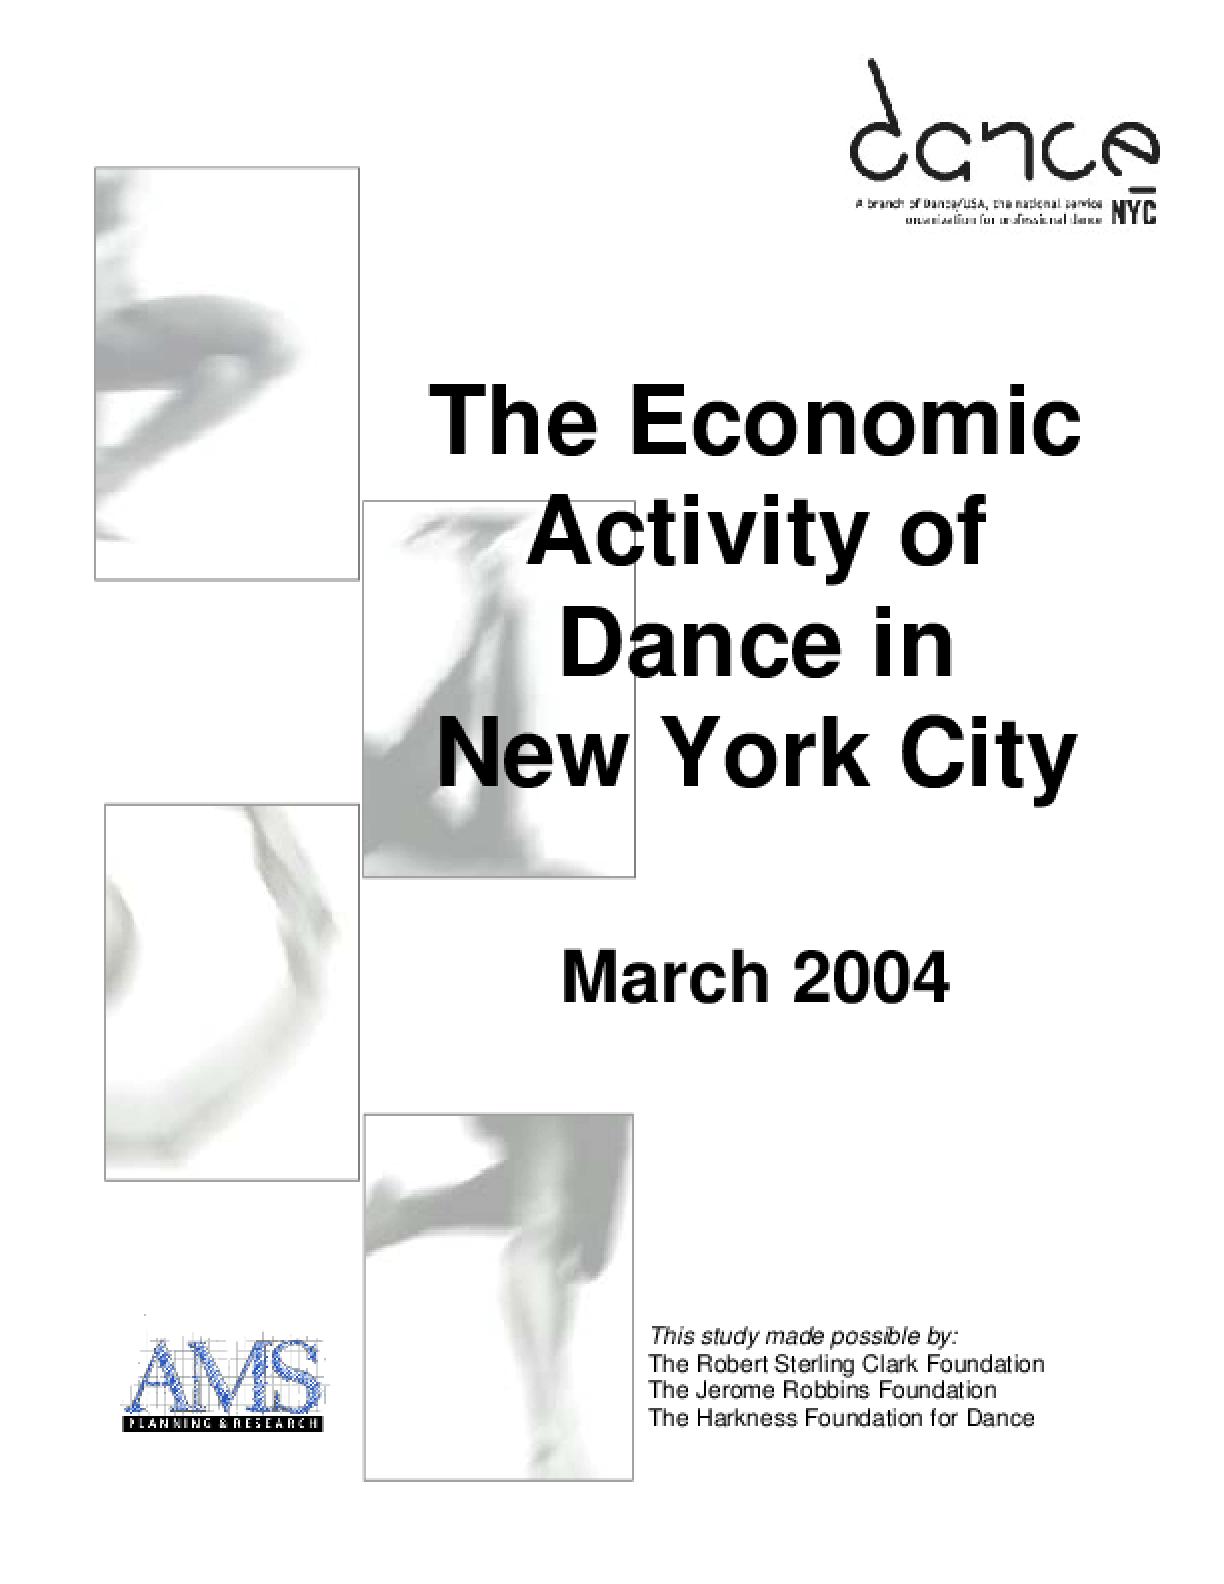 The Economic Activity of Dance in New York City: Executive Summary